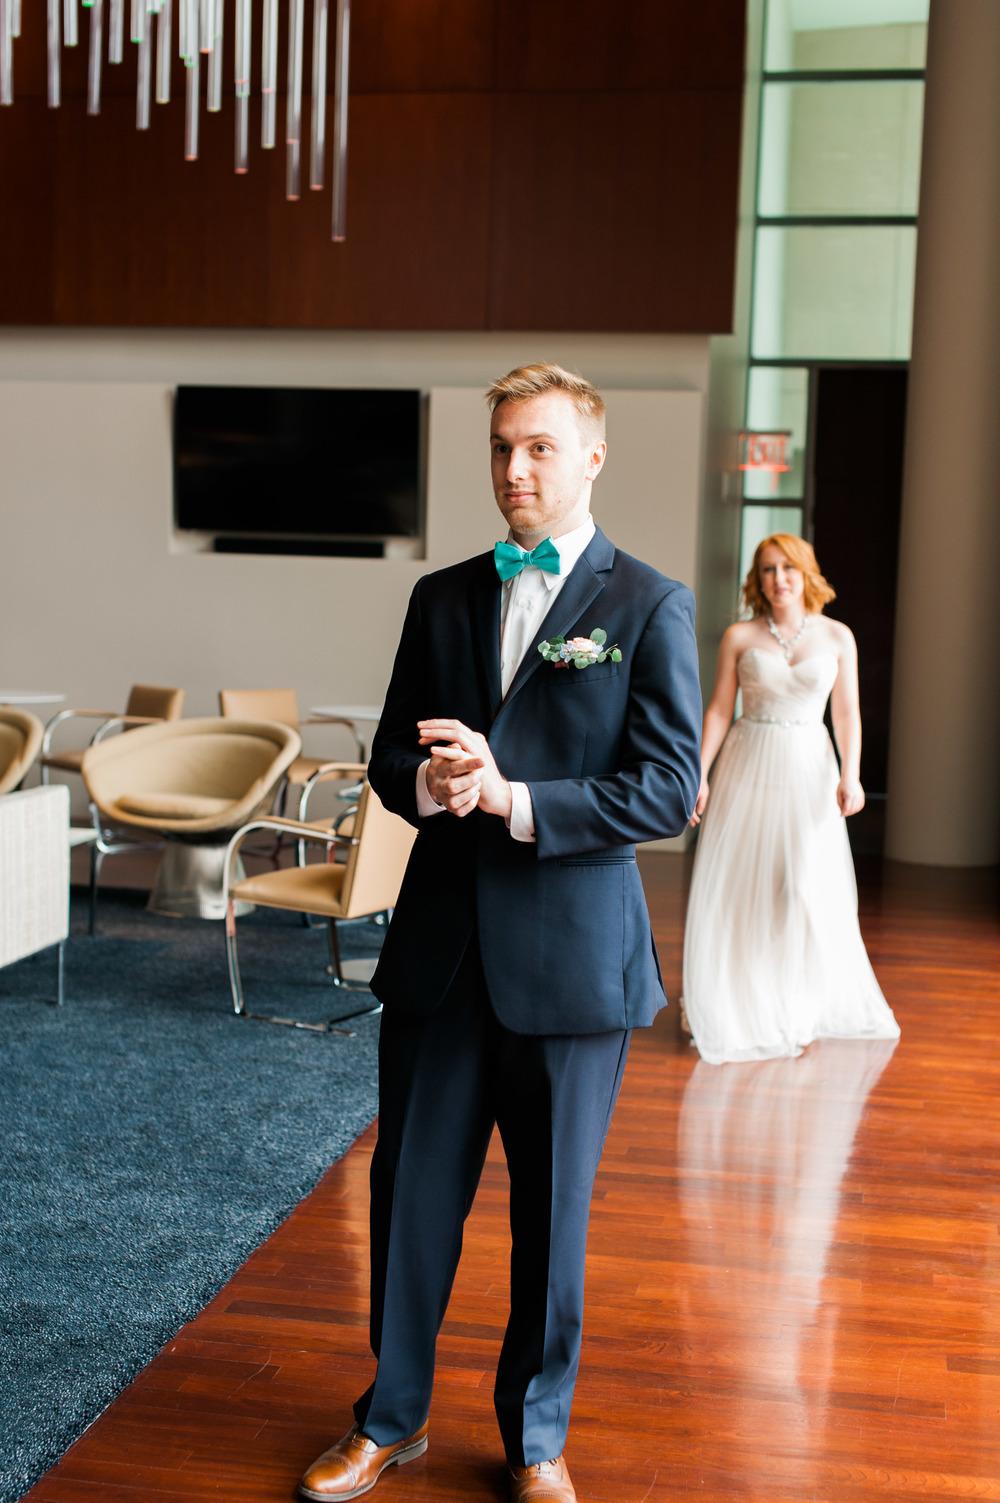 omaha-holland-arts-center-wedding-26.jpg